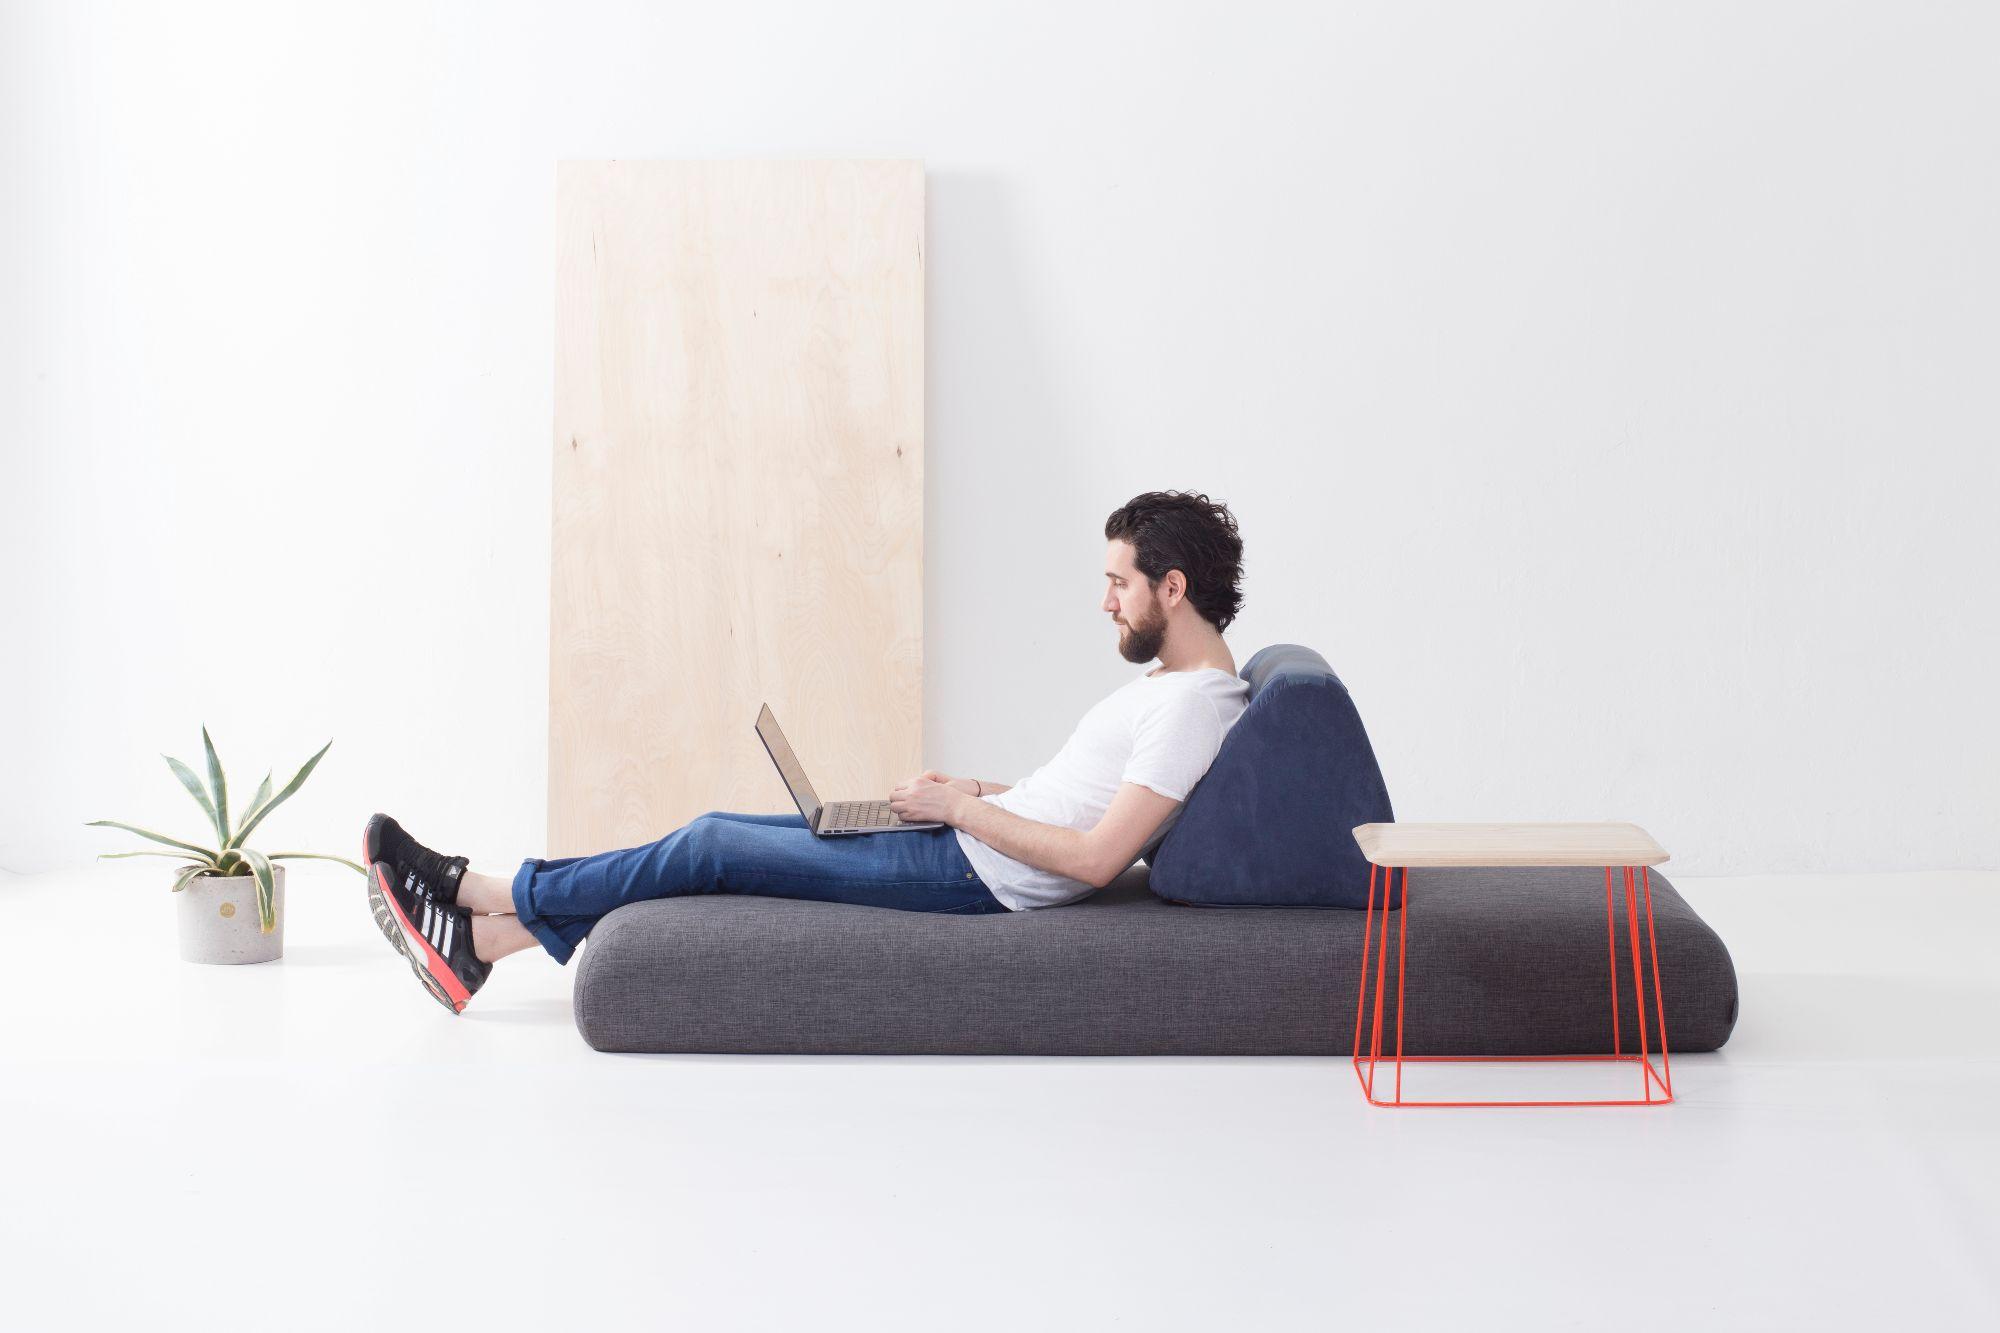 hannabi-box-urban-nomad-mobile-sofa-system-pics-hq-01.jpg